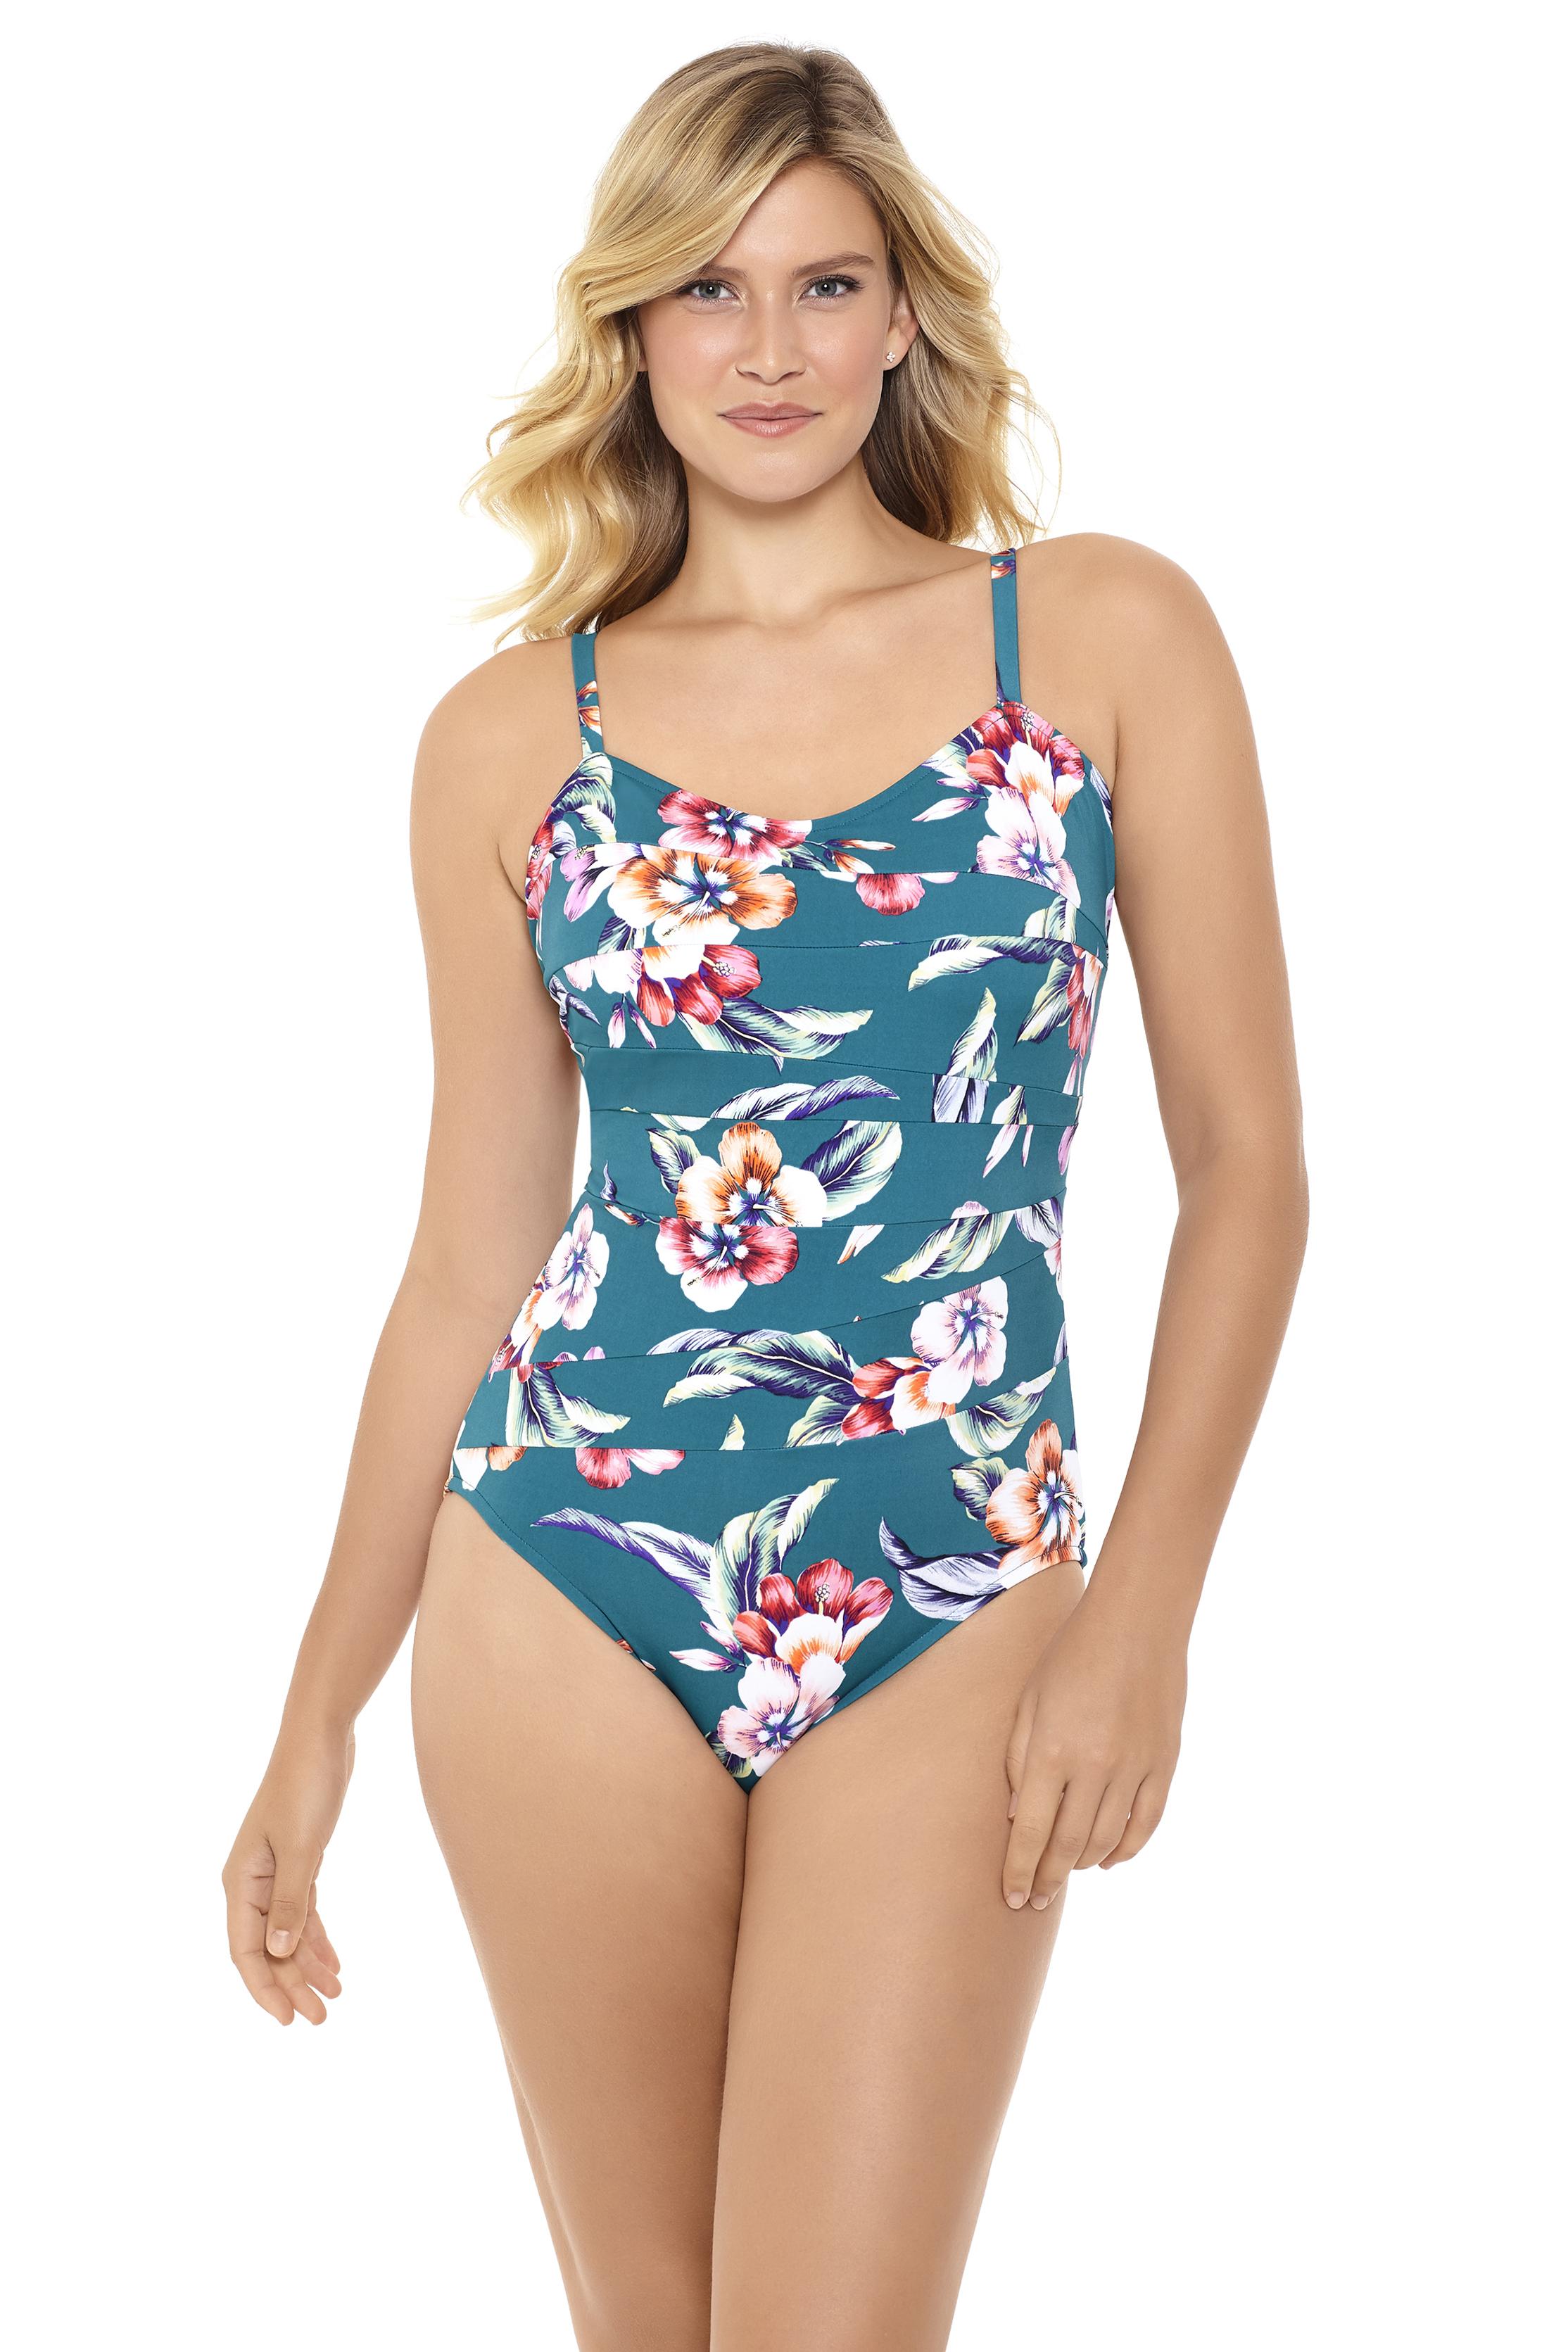 Penbrooke Vintage Floral Seamed One Piece Swimsuit -Teal - Front